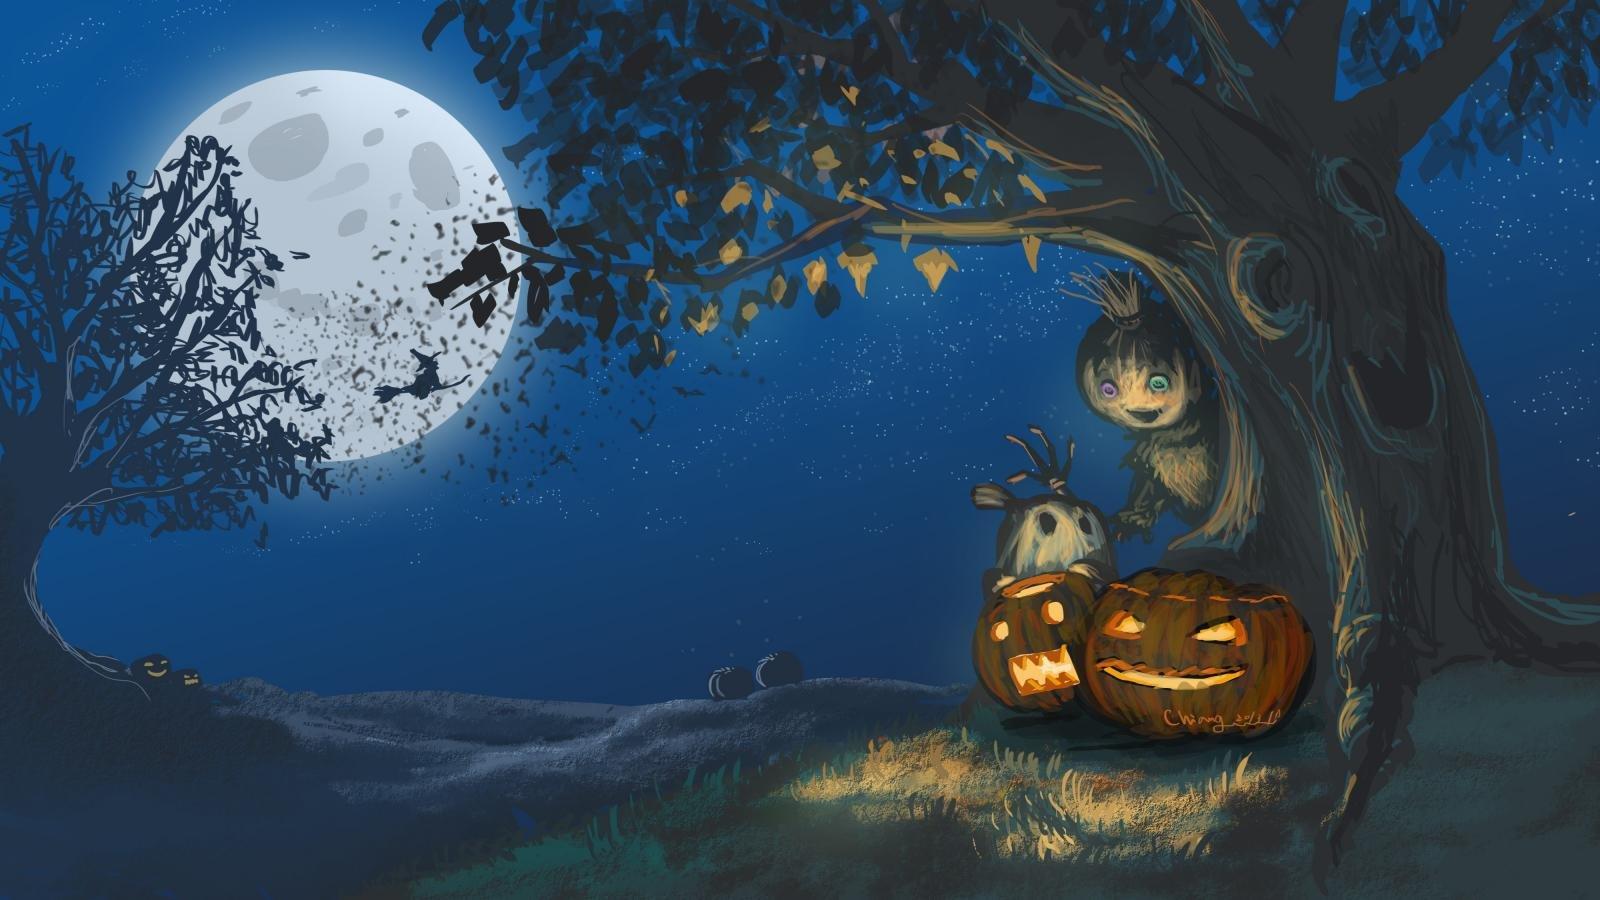 Download Hd Halloween Pc Wallpaper Id Halloween Wallpaper Pc 1600x900 Wallpaper Teahub Io